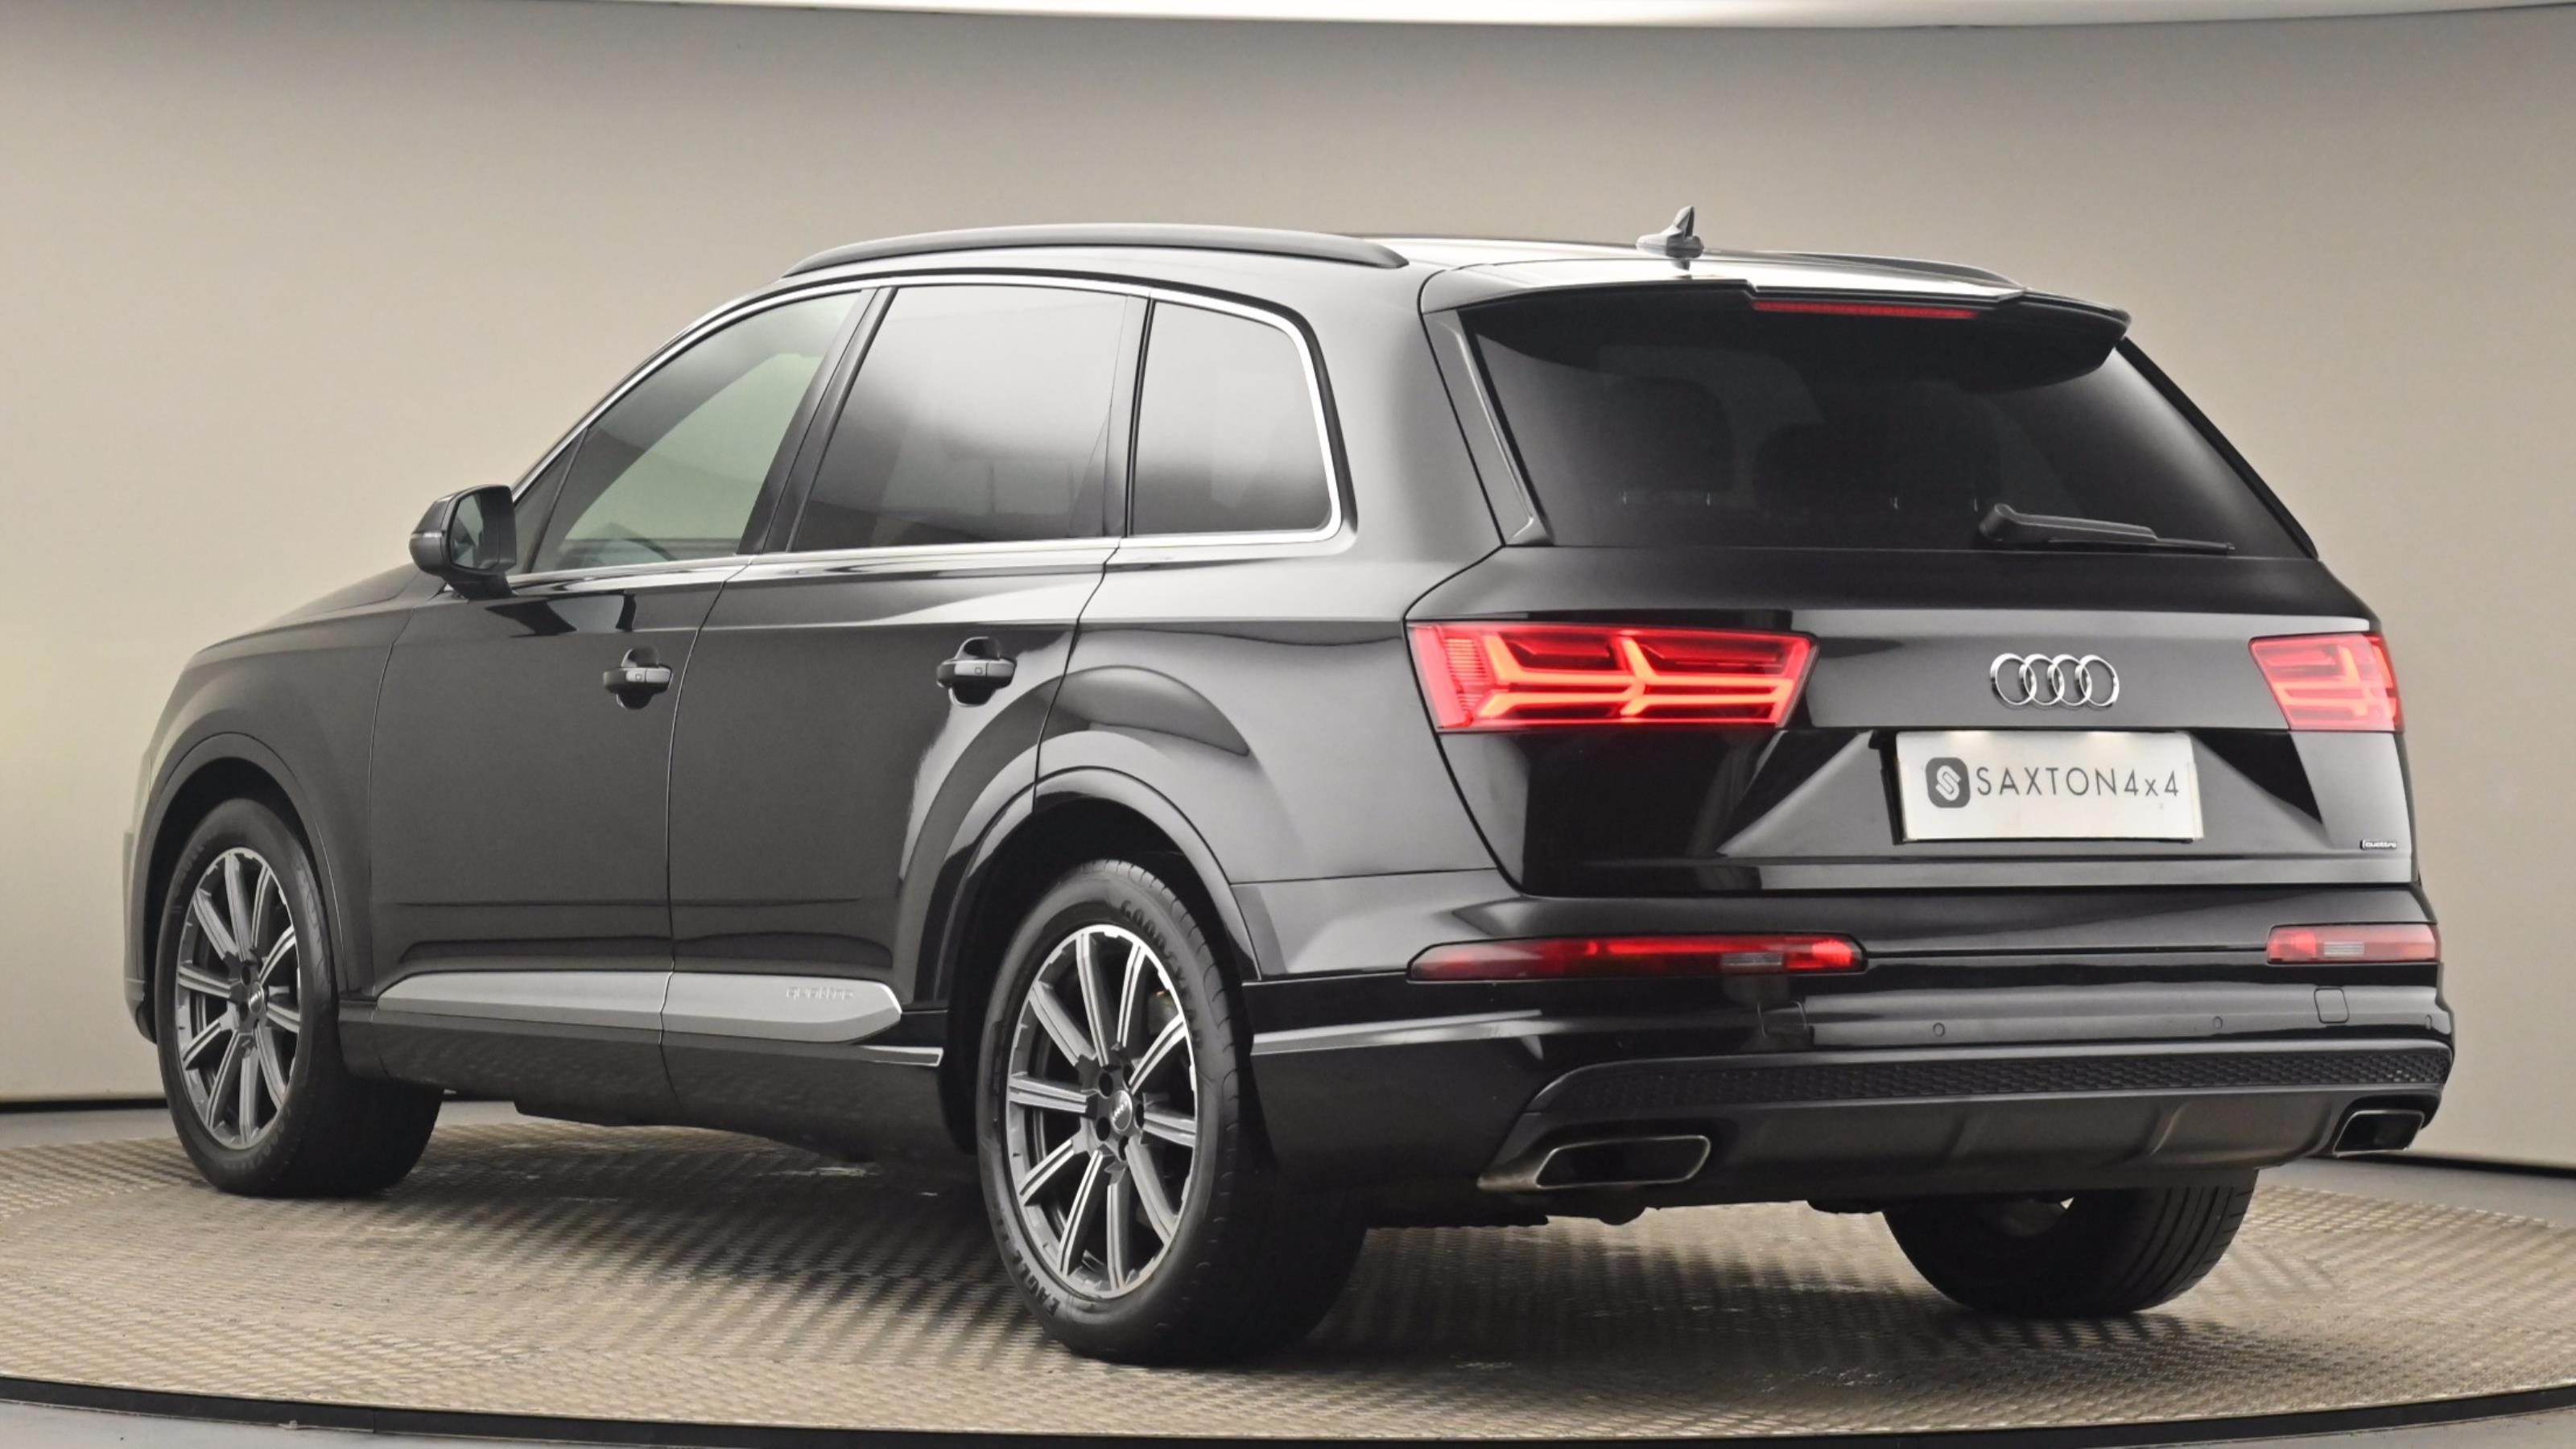 Used 2016 Audi Q7 3.0 TDI Quattro S Line 5dr Tip Auto BLACK at Saxton4x4